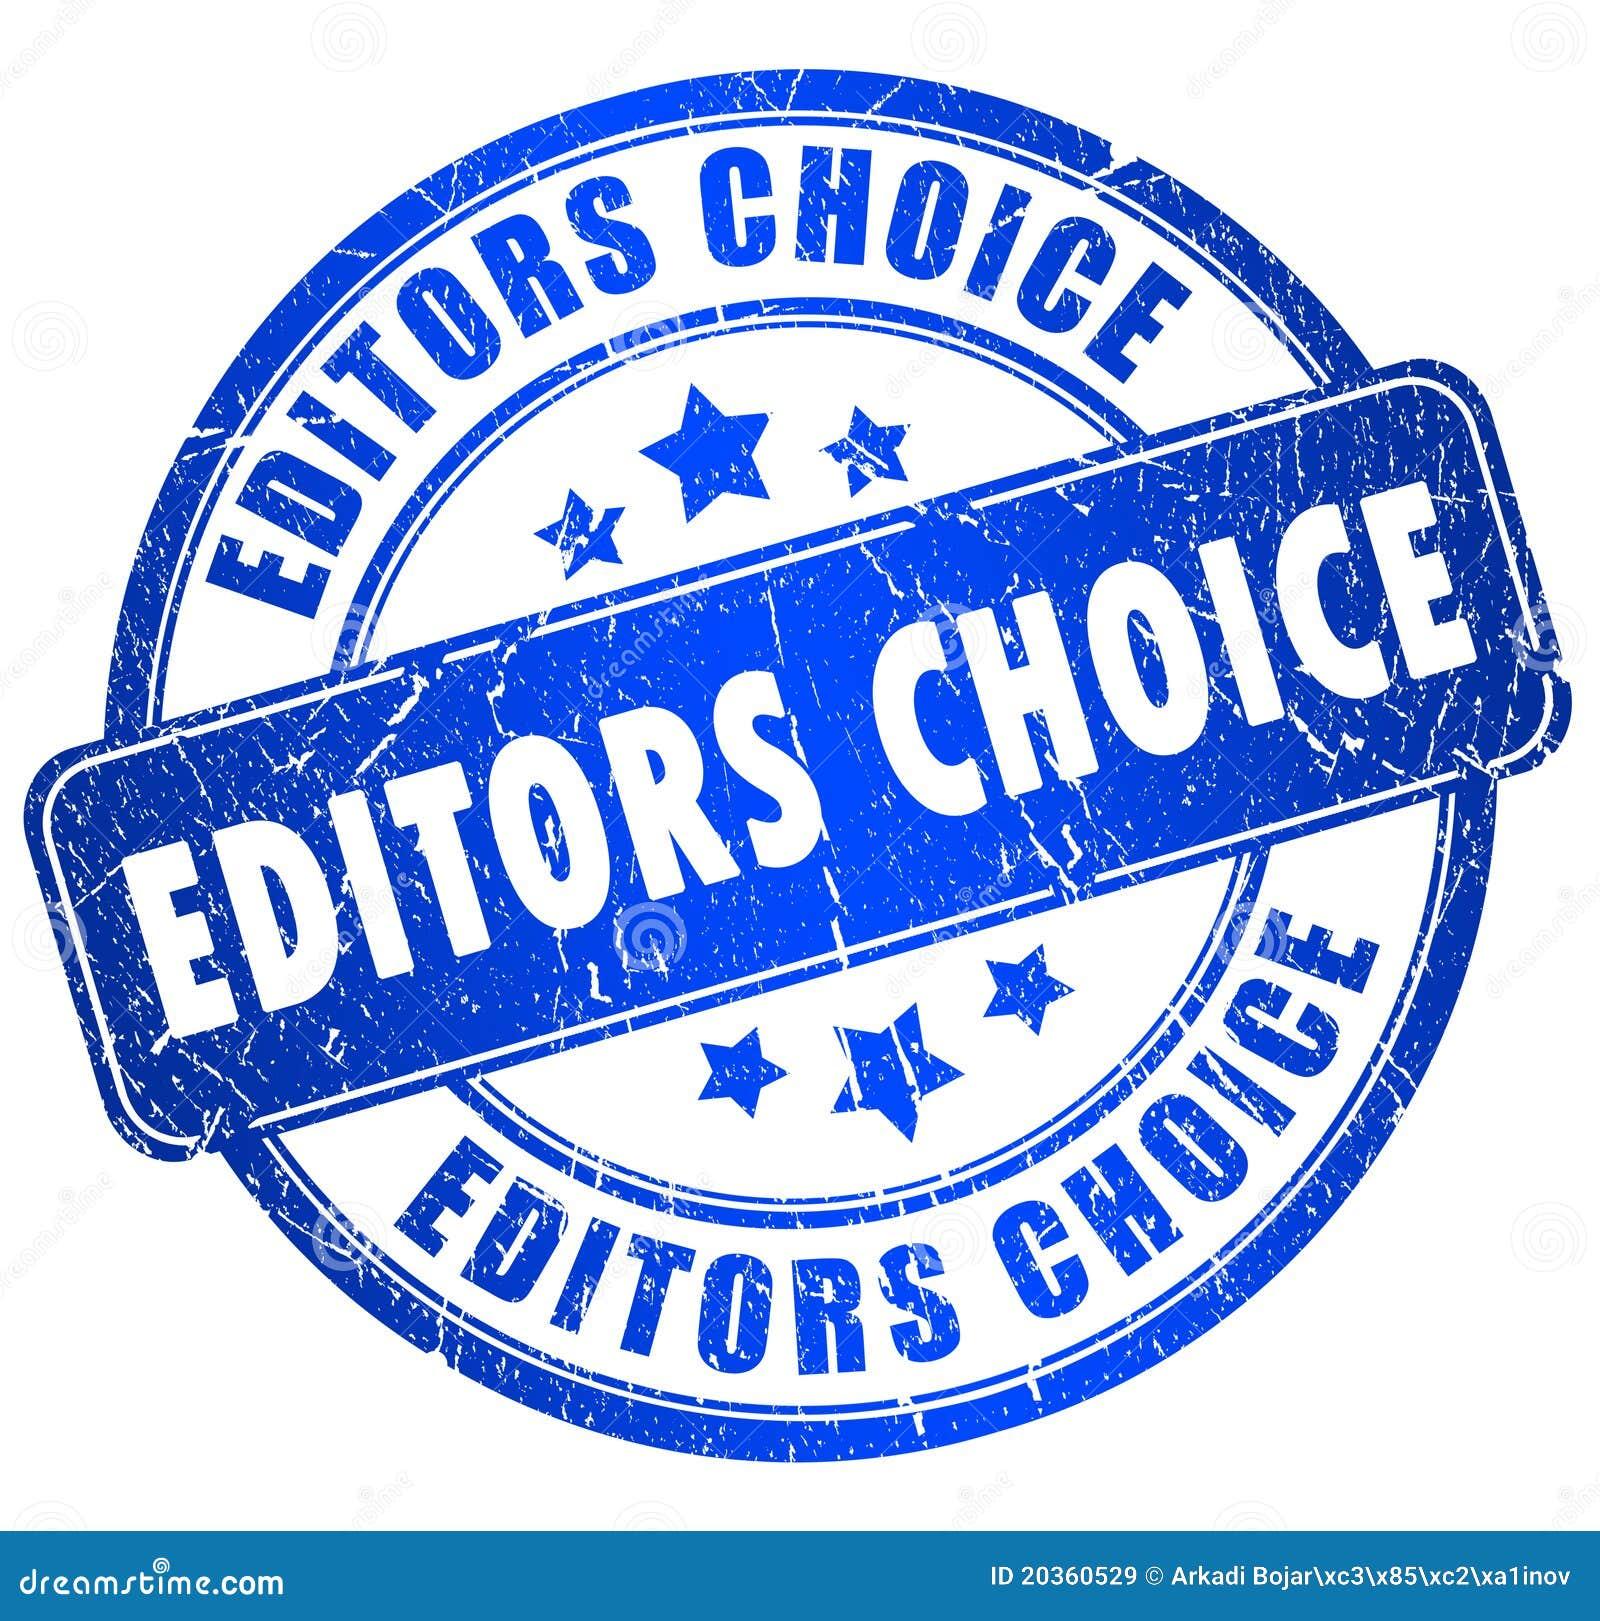 Editors choice stock illustration. Illustration of choose - 20360529 4dee2718df7fc